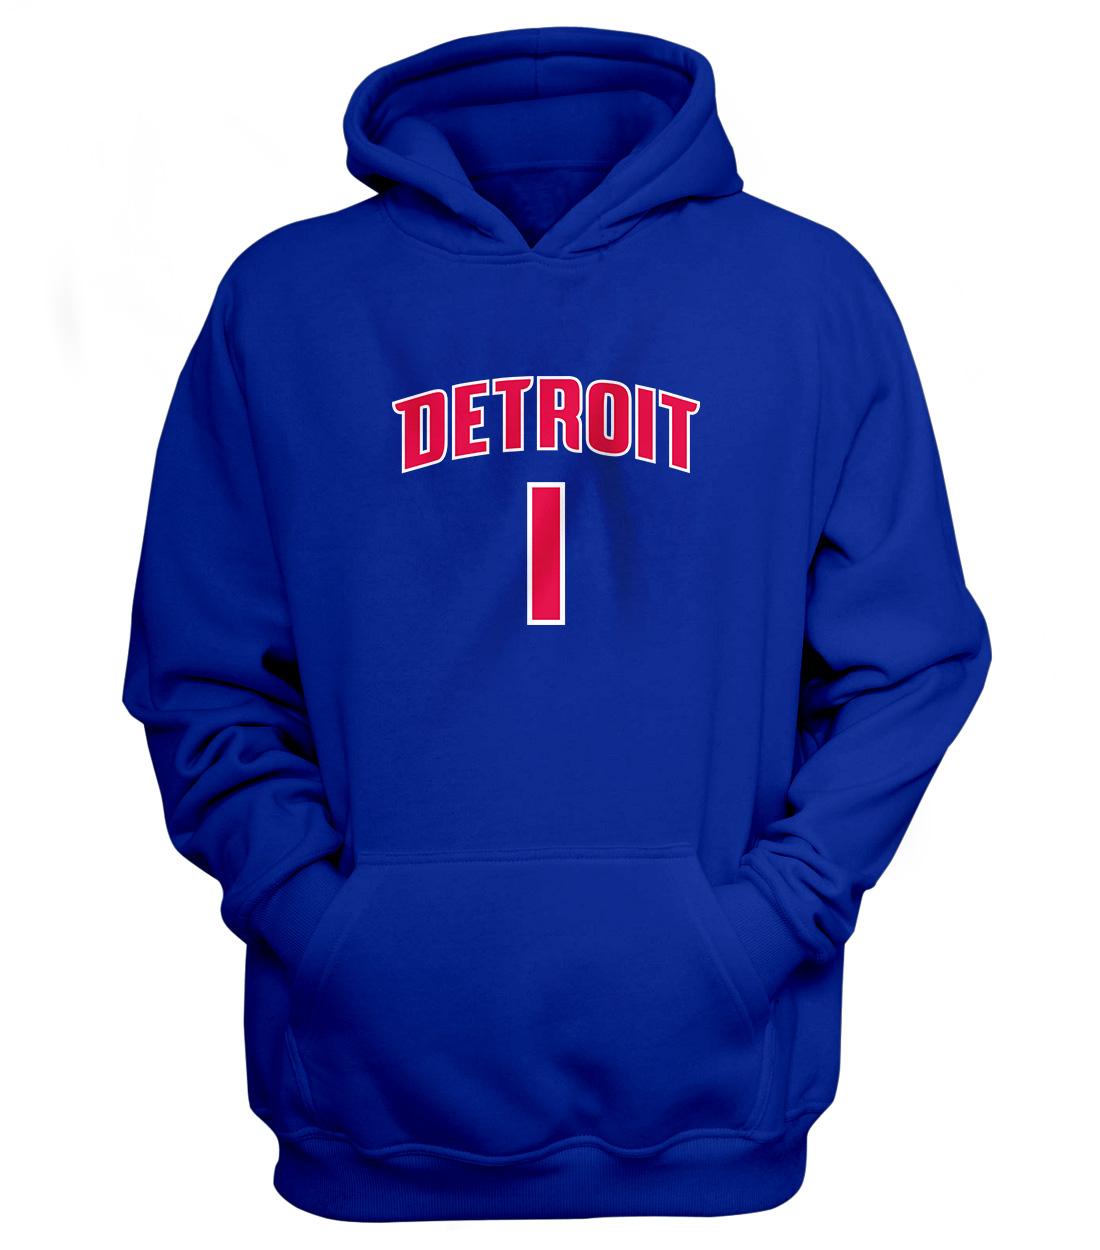 Detroit Pistons Chauncey Billups Hoodie (HD-BLU-NP-75-PLYR-DET-BILLUPS.FRM)